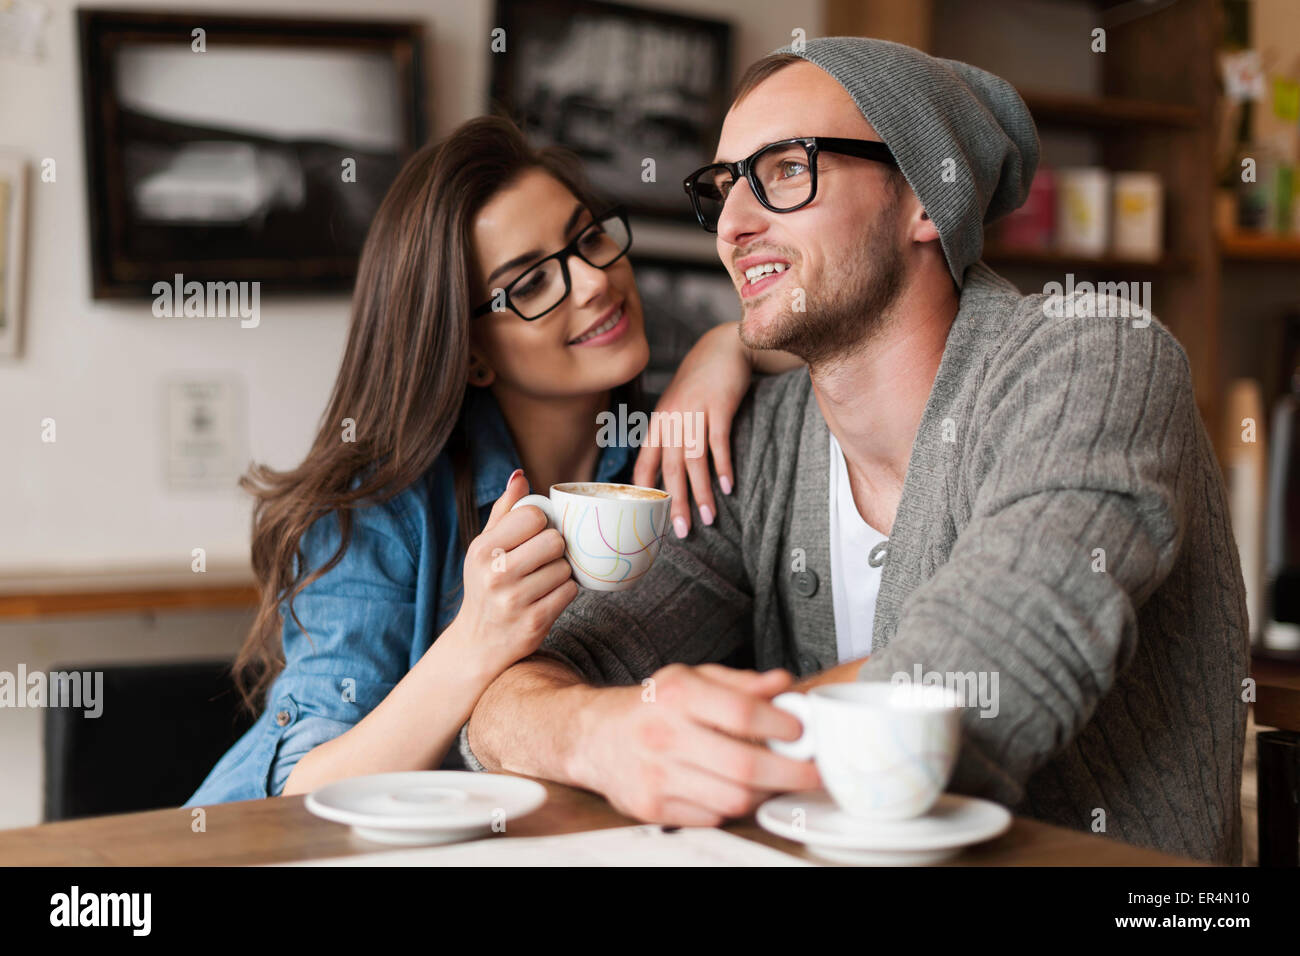 Glücklicher Mann und Frau im Café. Krakau, Polen Stockbild